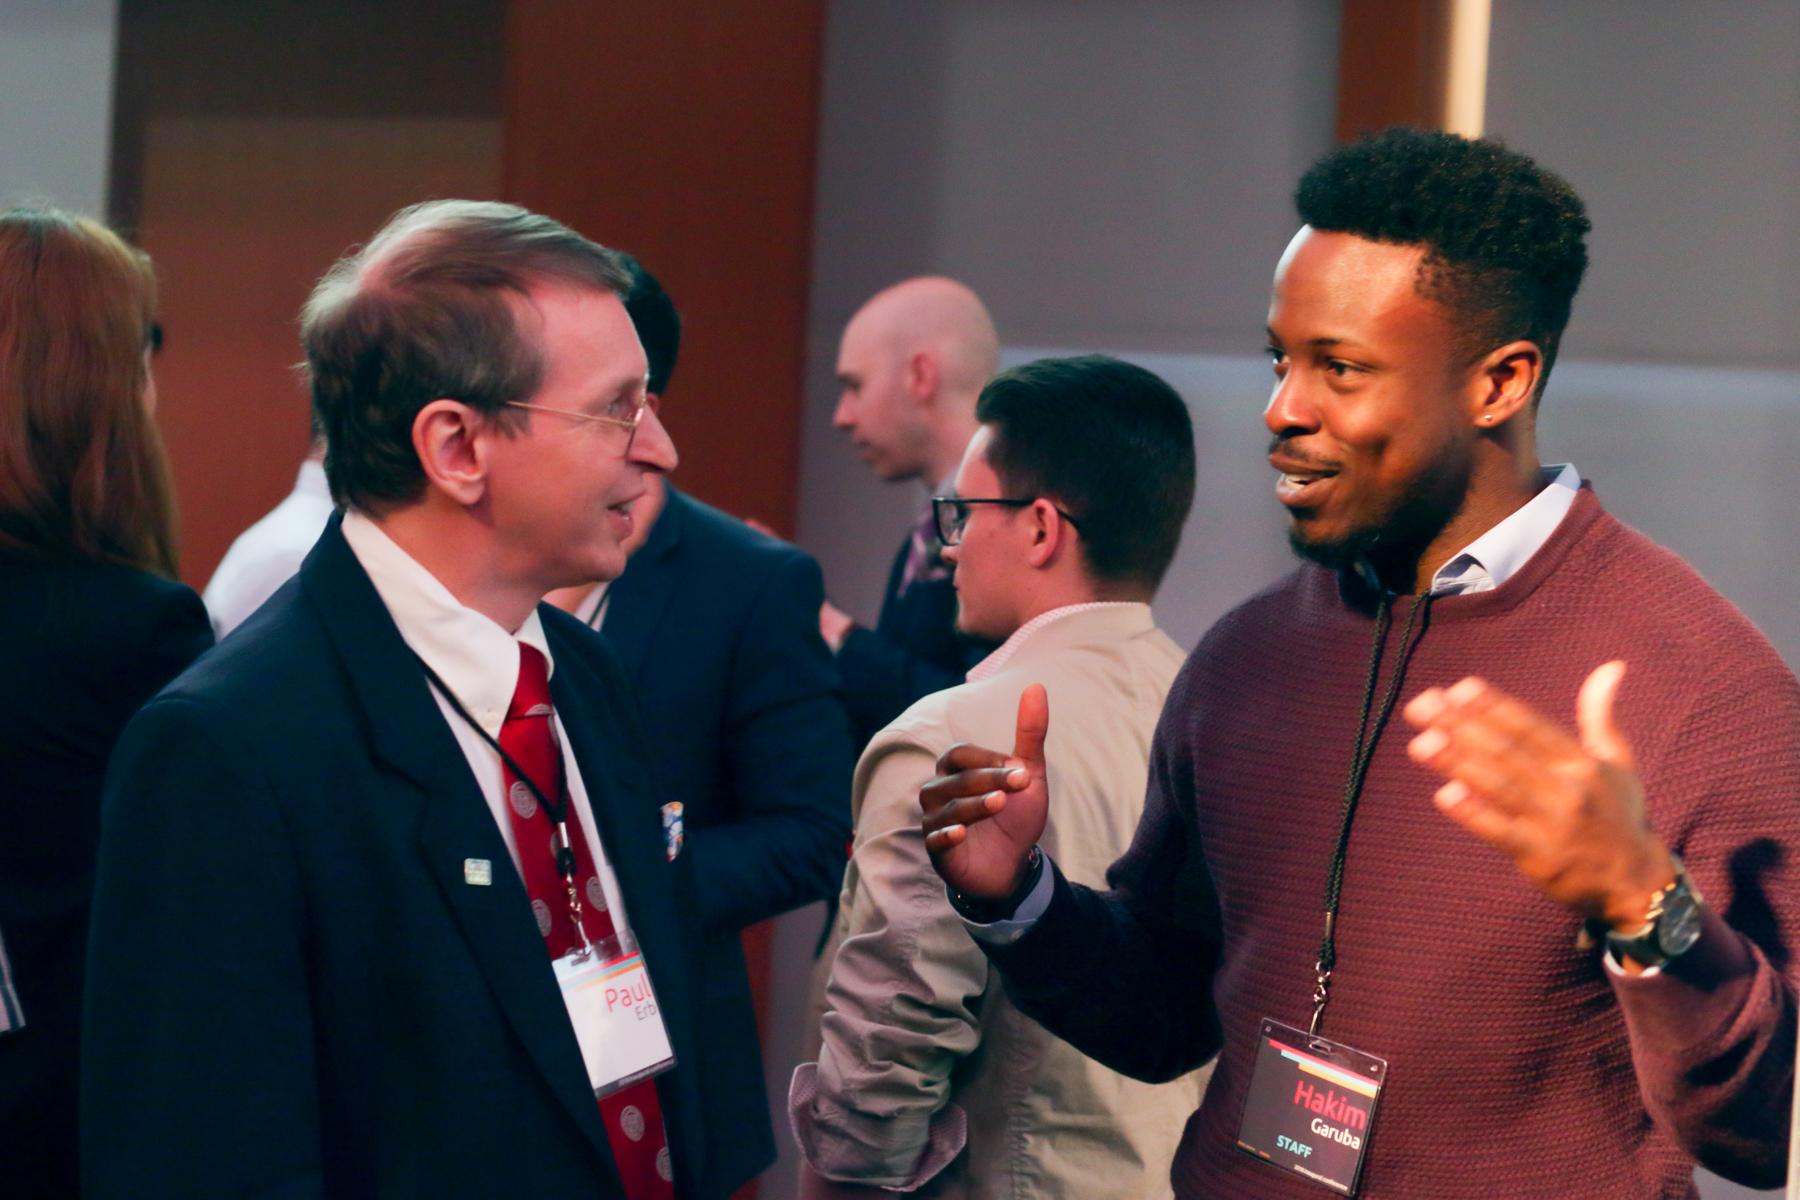 ABD_Conference_2018-036.jpg